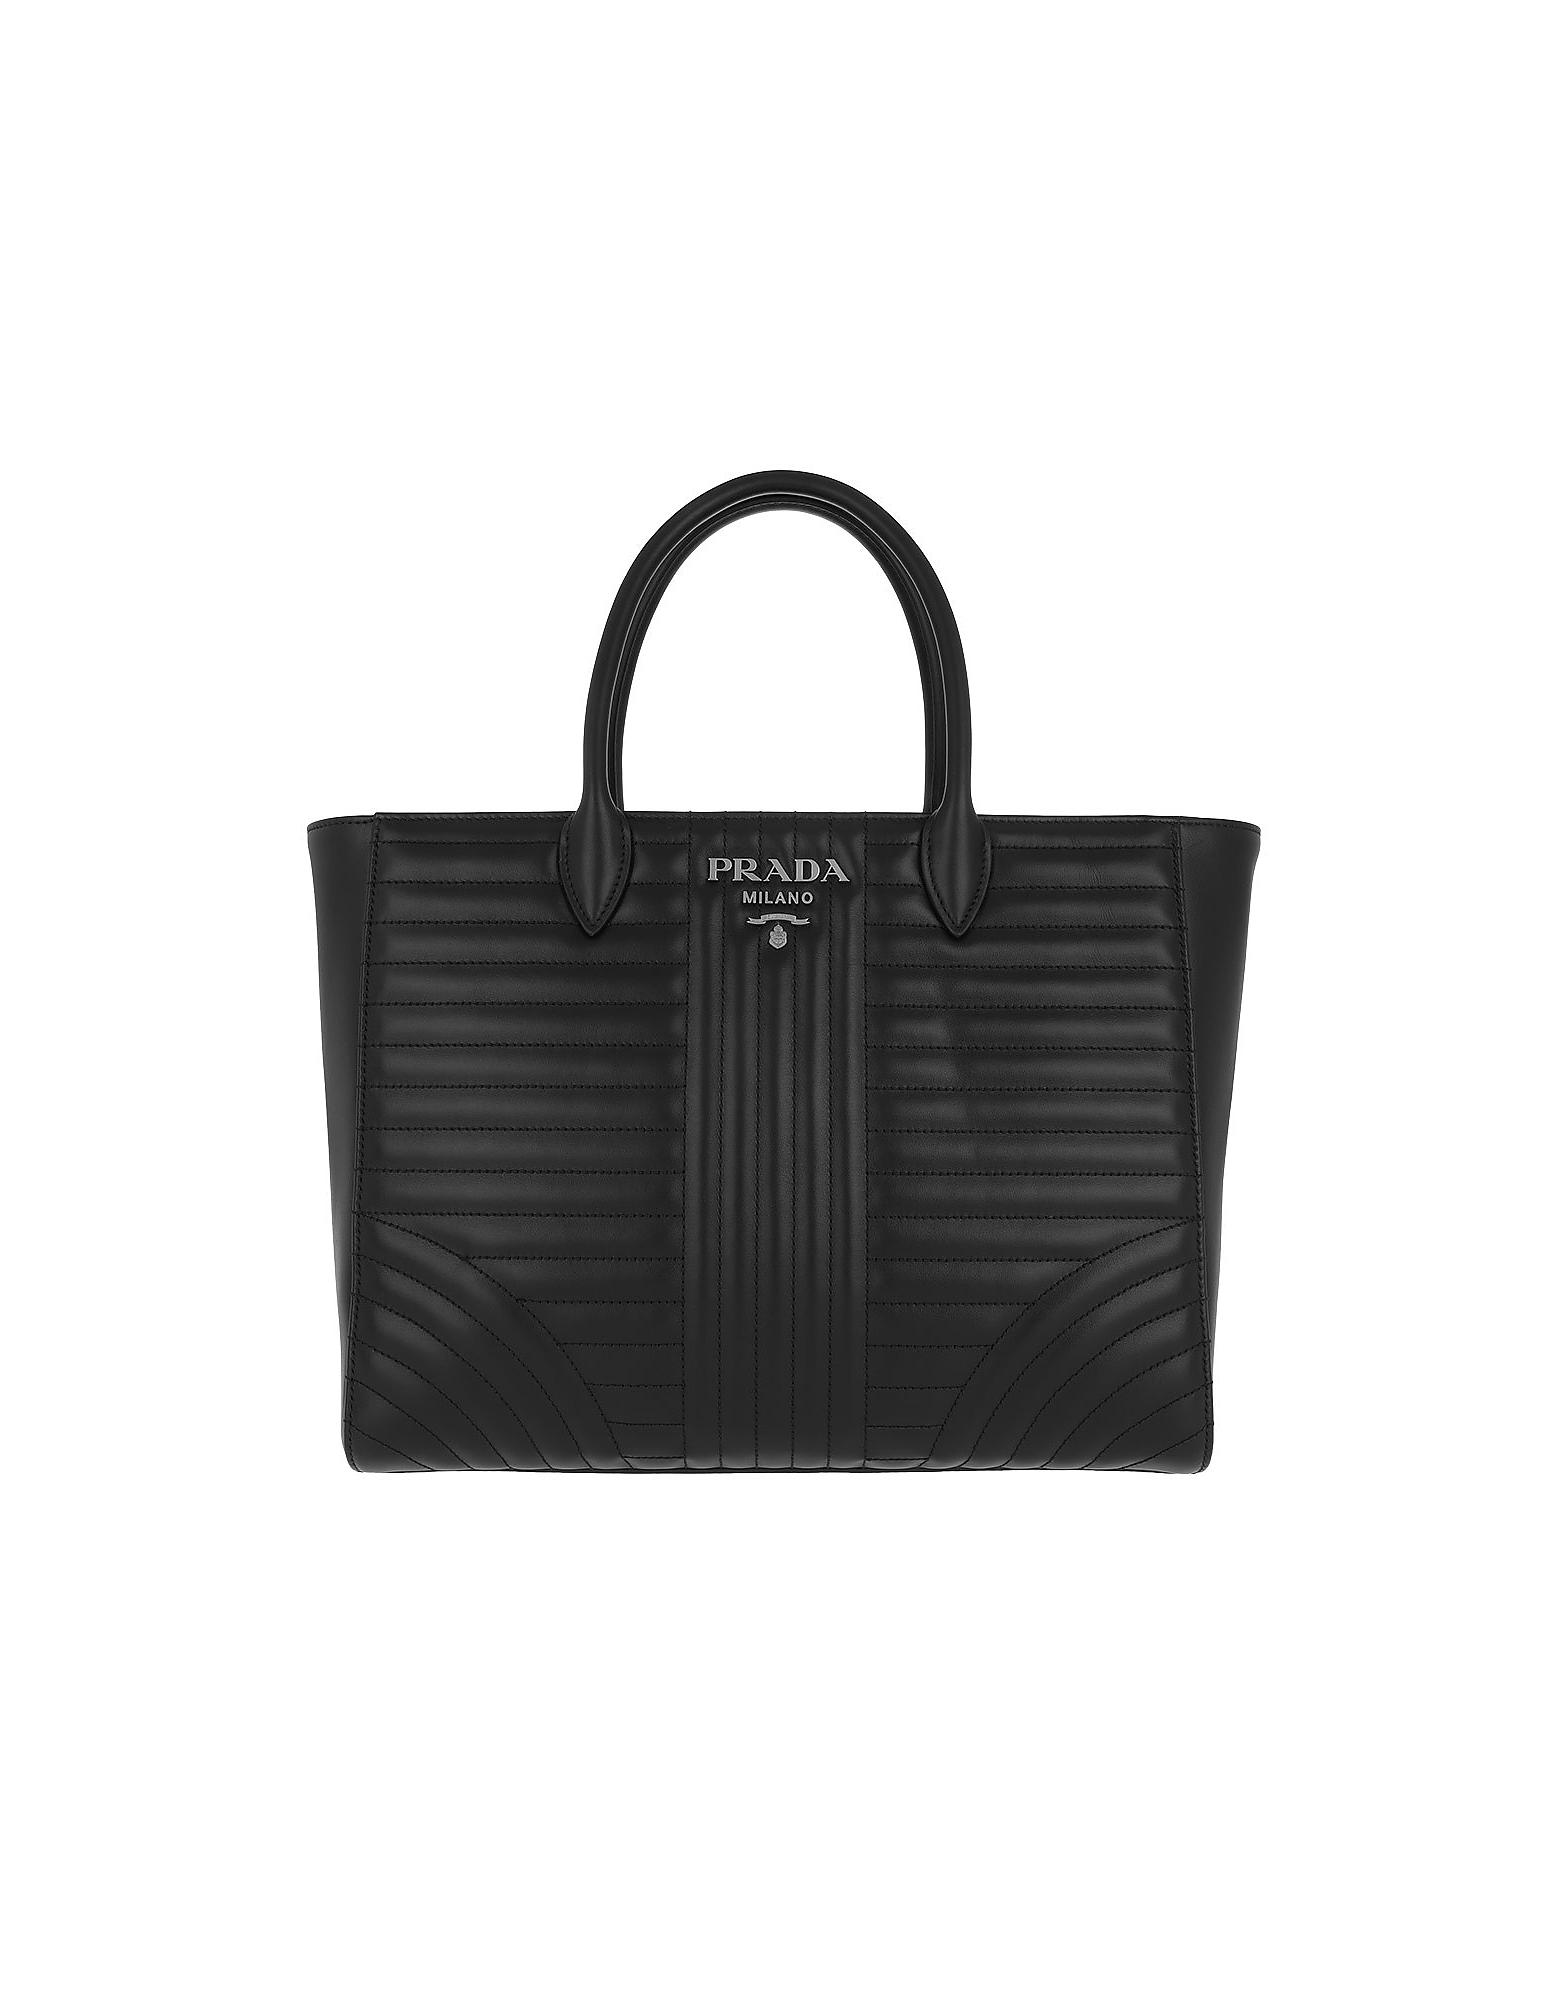 ec70fa27863e9f Prada Diagramme Tote Quilted Leather Nero 2 In Black | ModeSens